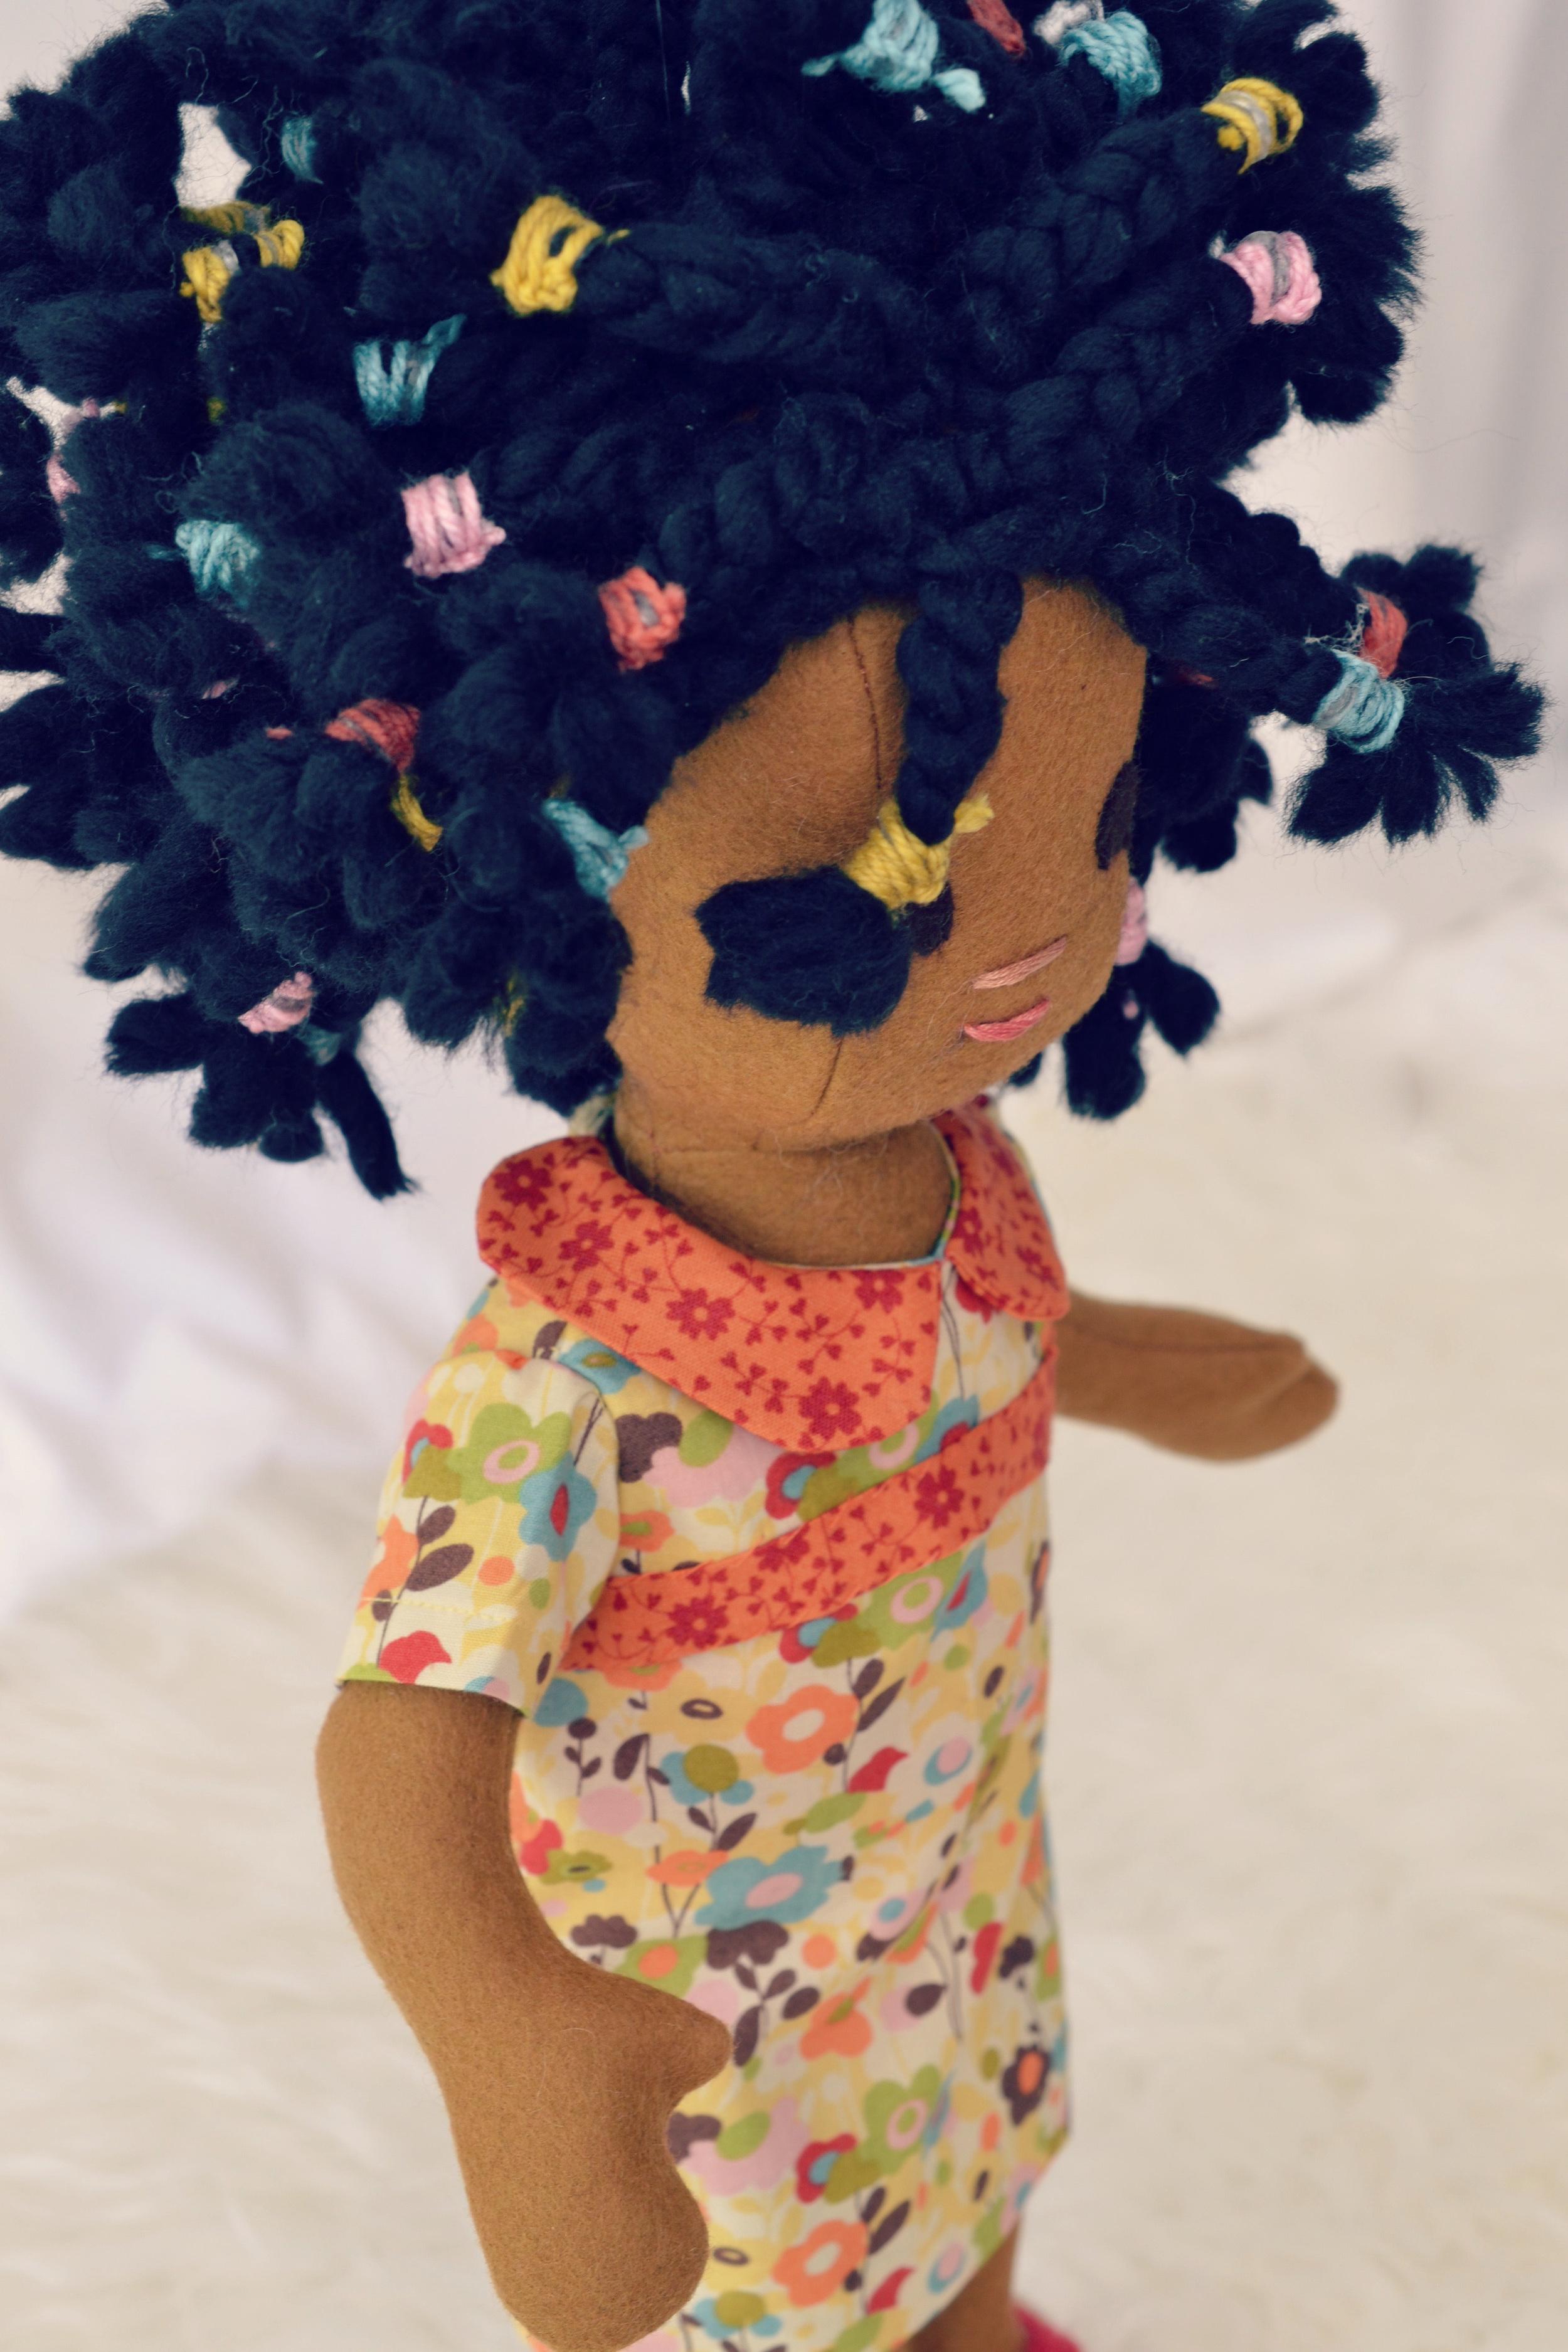 The Handmade Dolls-616.jpg